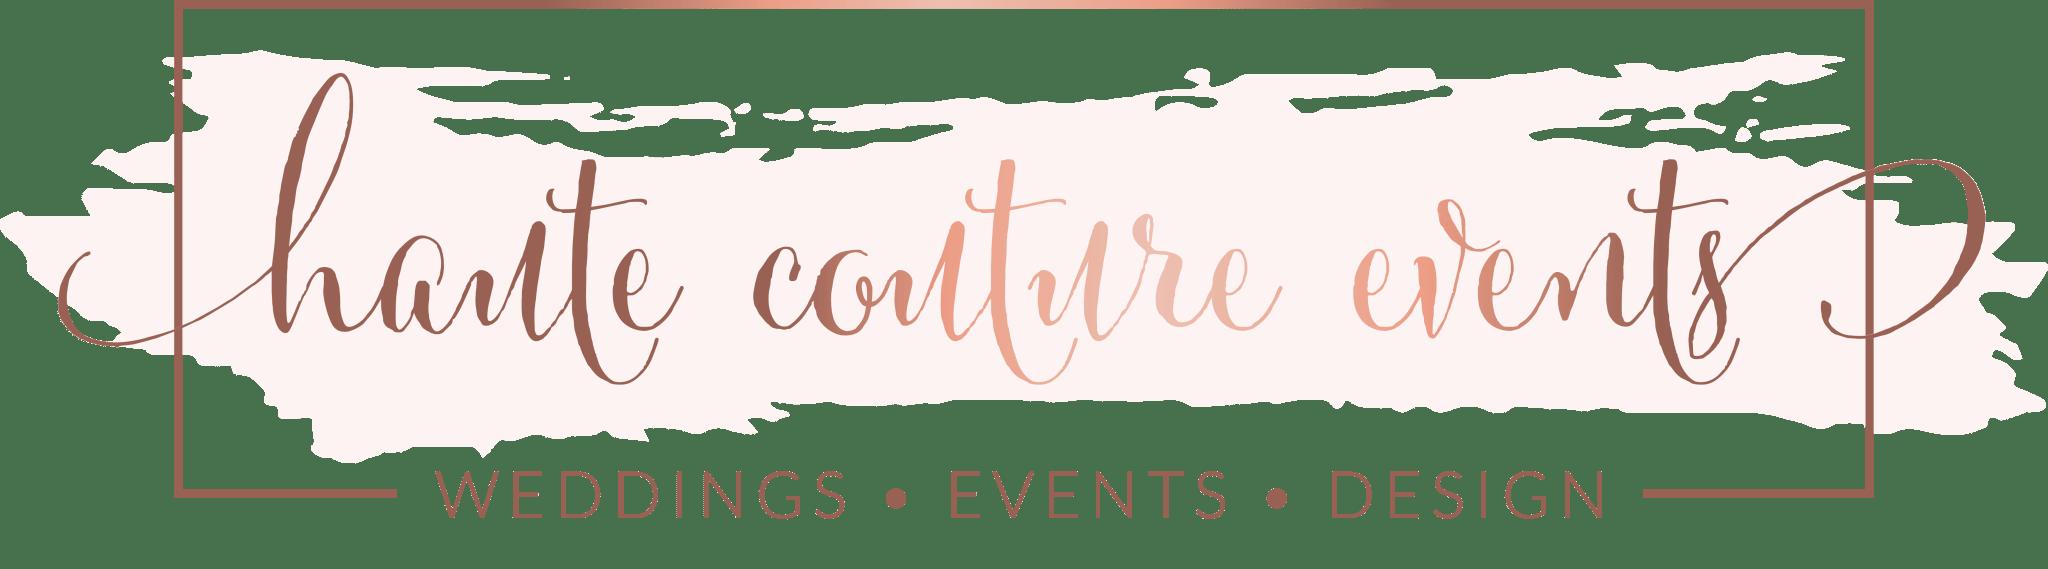 Miami wedding planner - Miami event planner - Wedding designer - Haute Couture Events